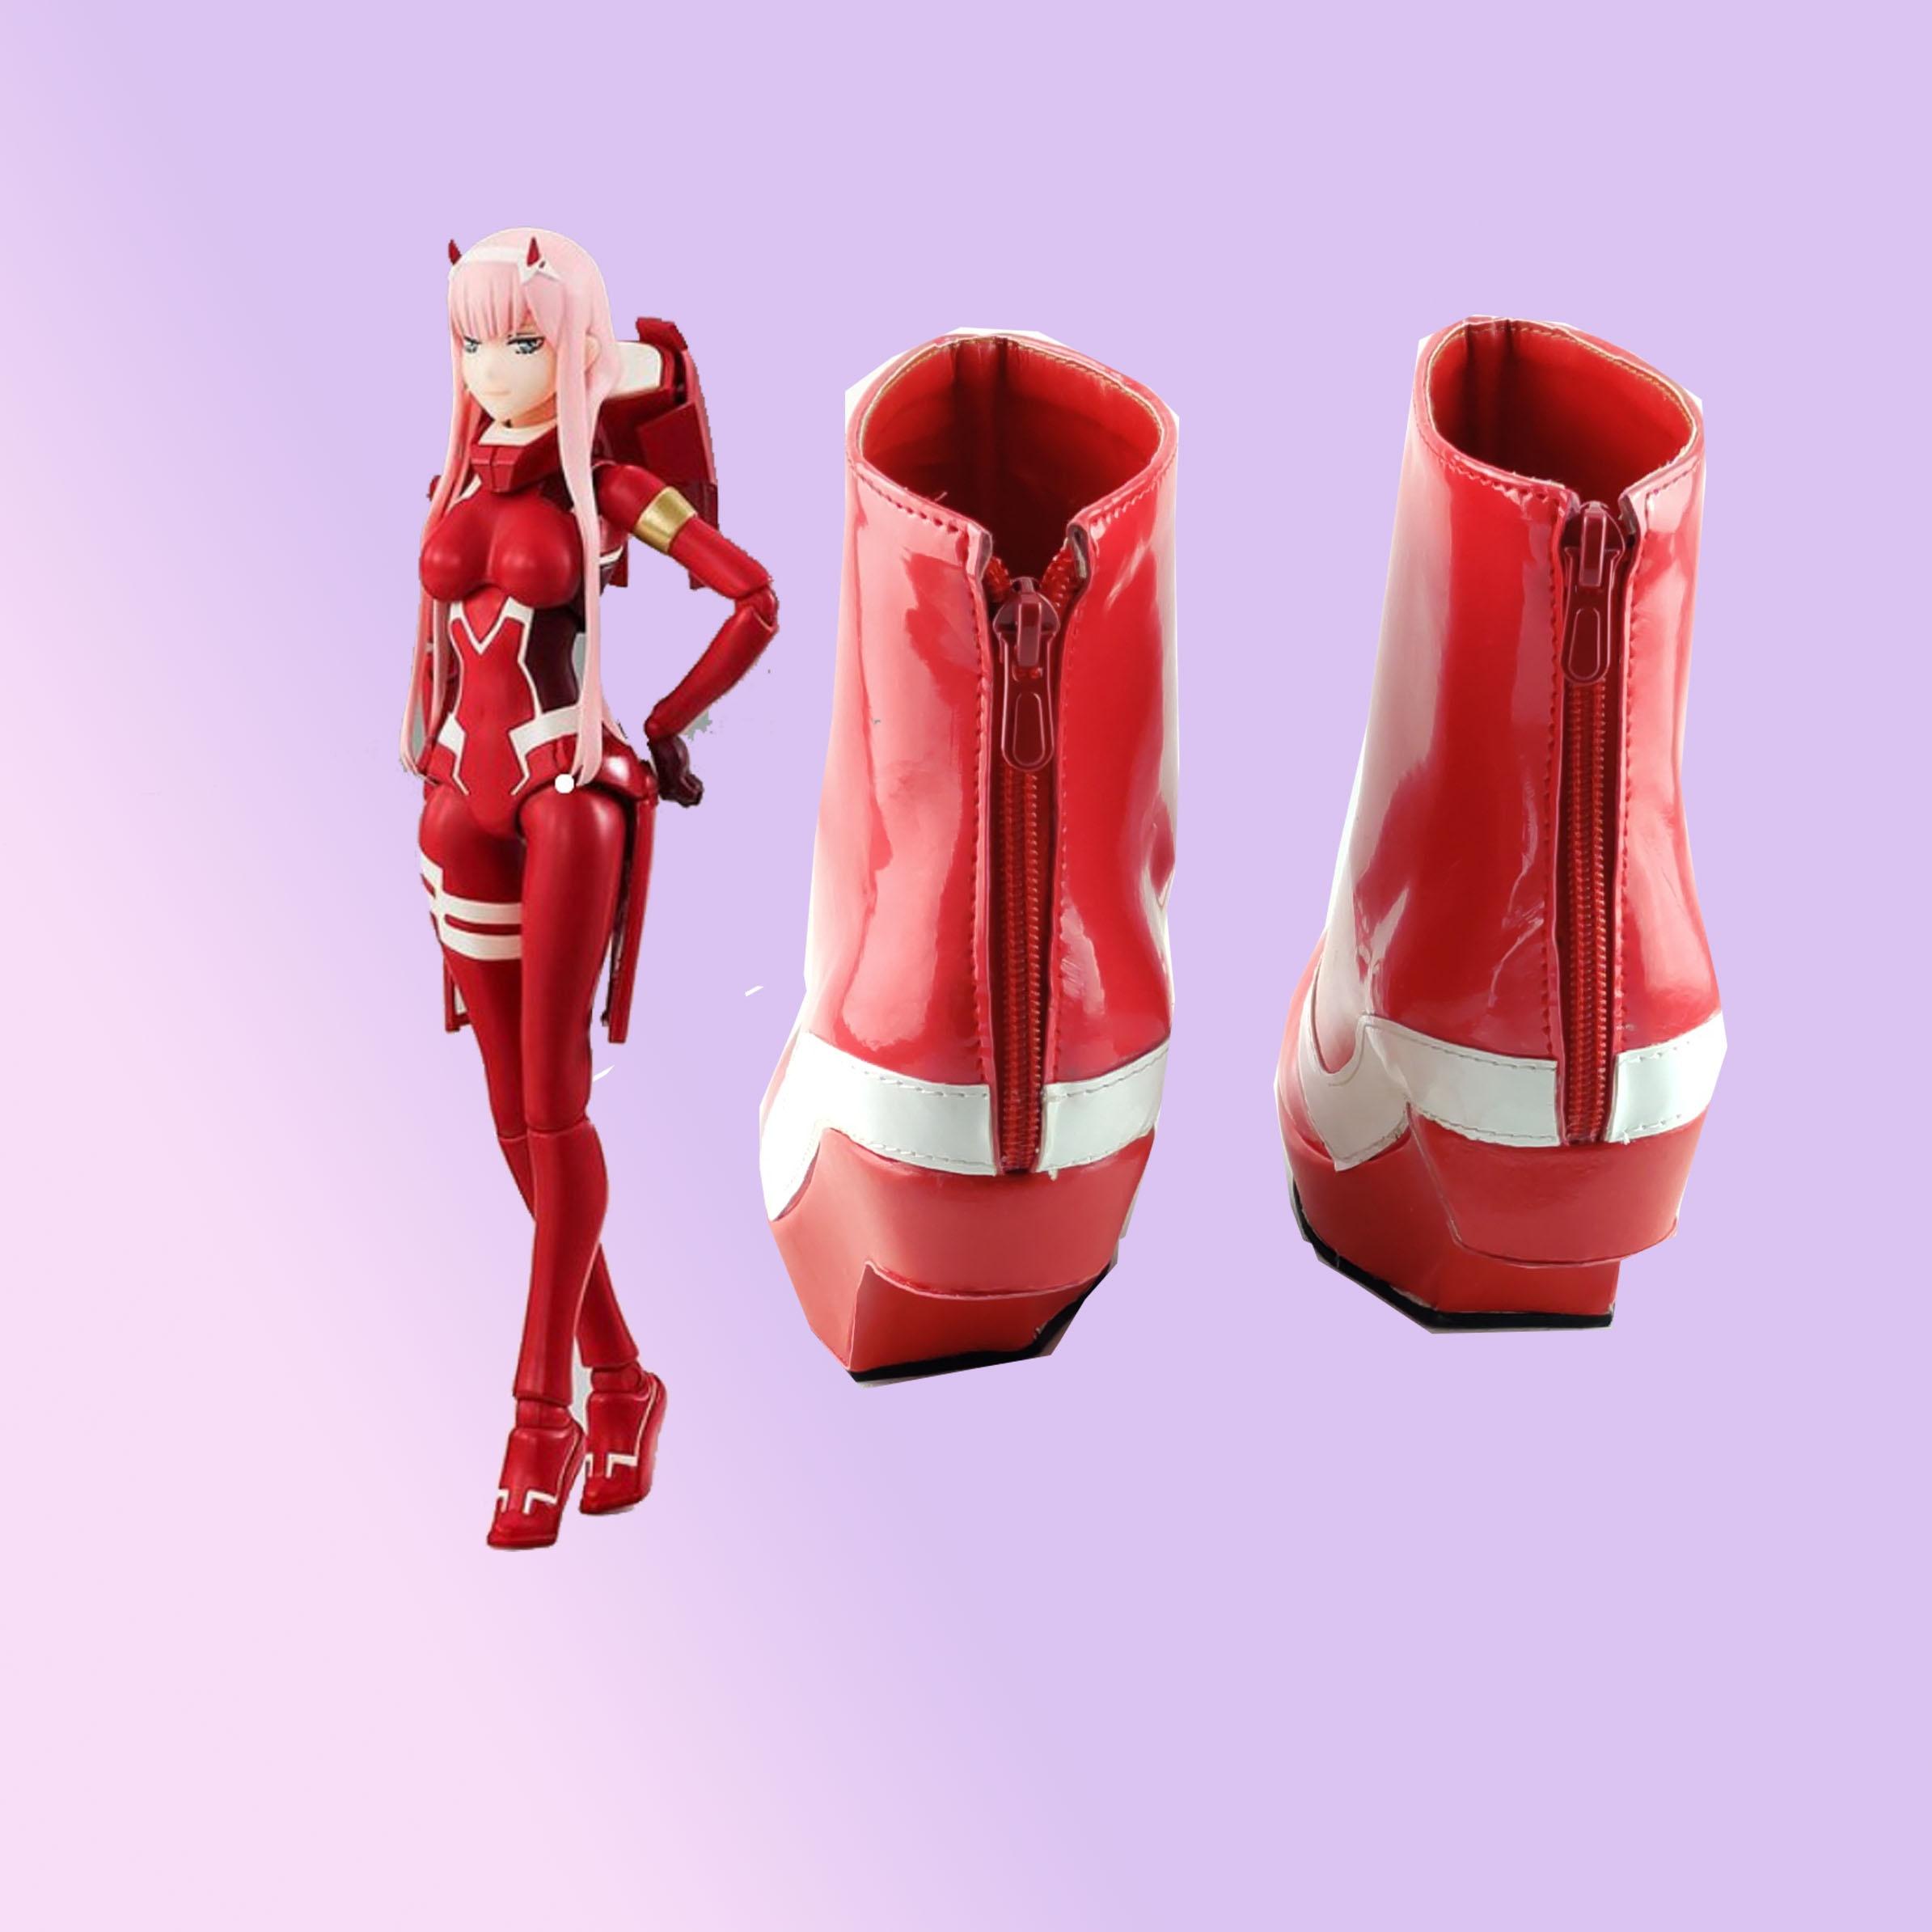 服图来cosplay国家队鞋02cos驾驶定做战斗darlinginthefranxx